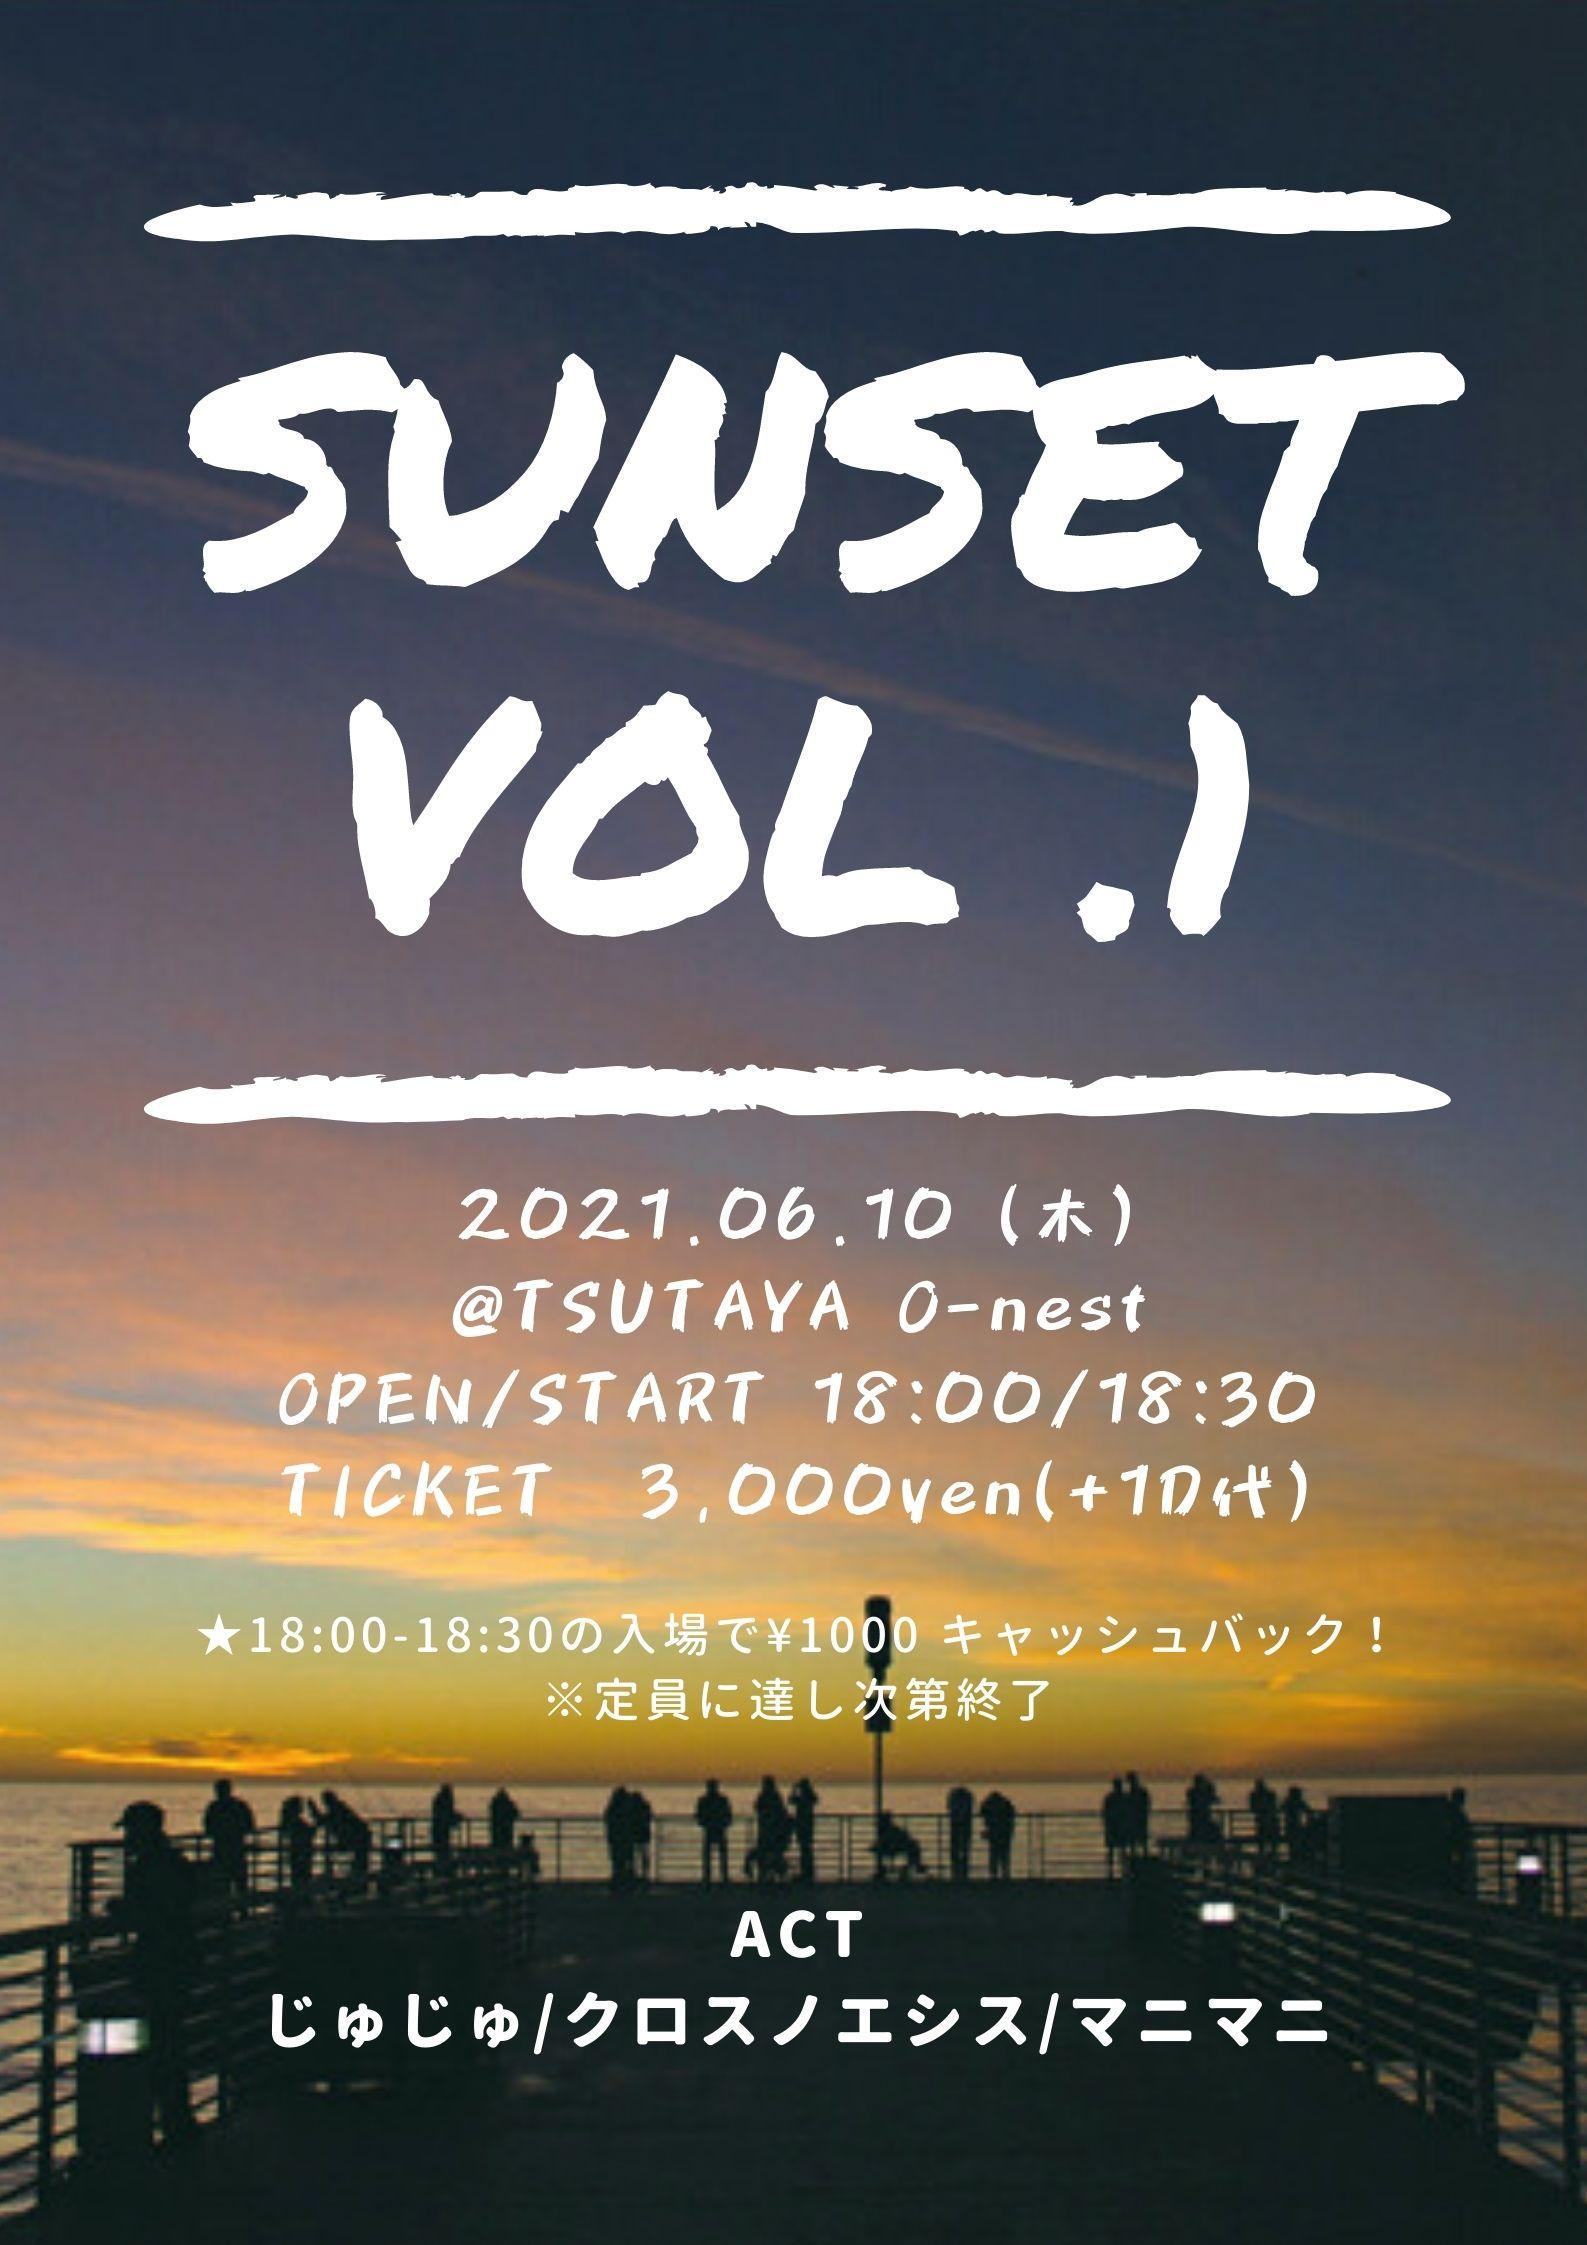 SUNSET Vol.1